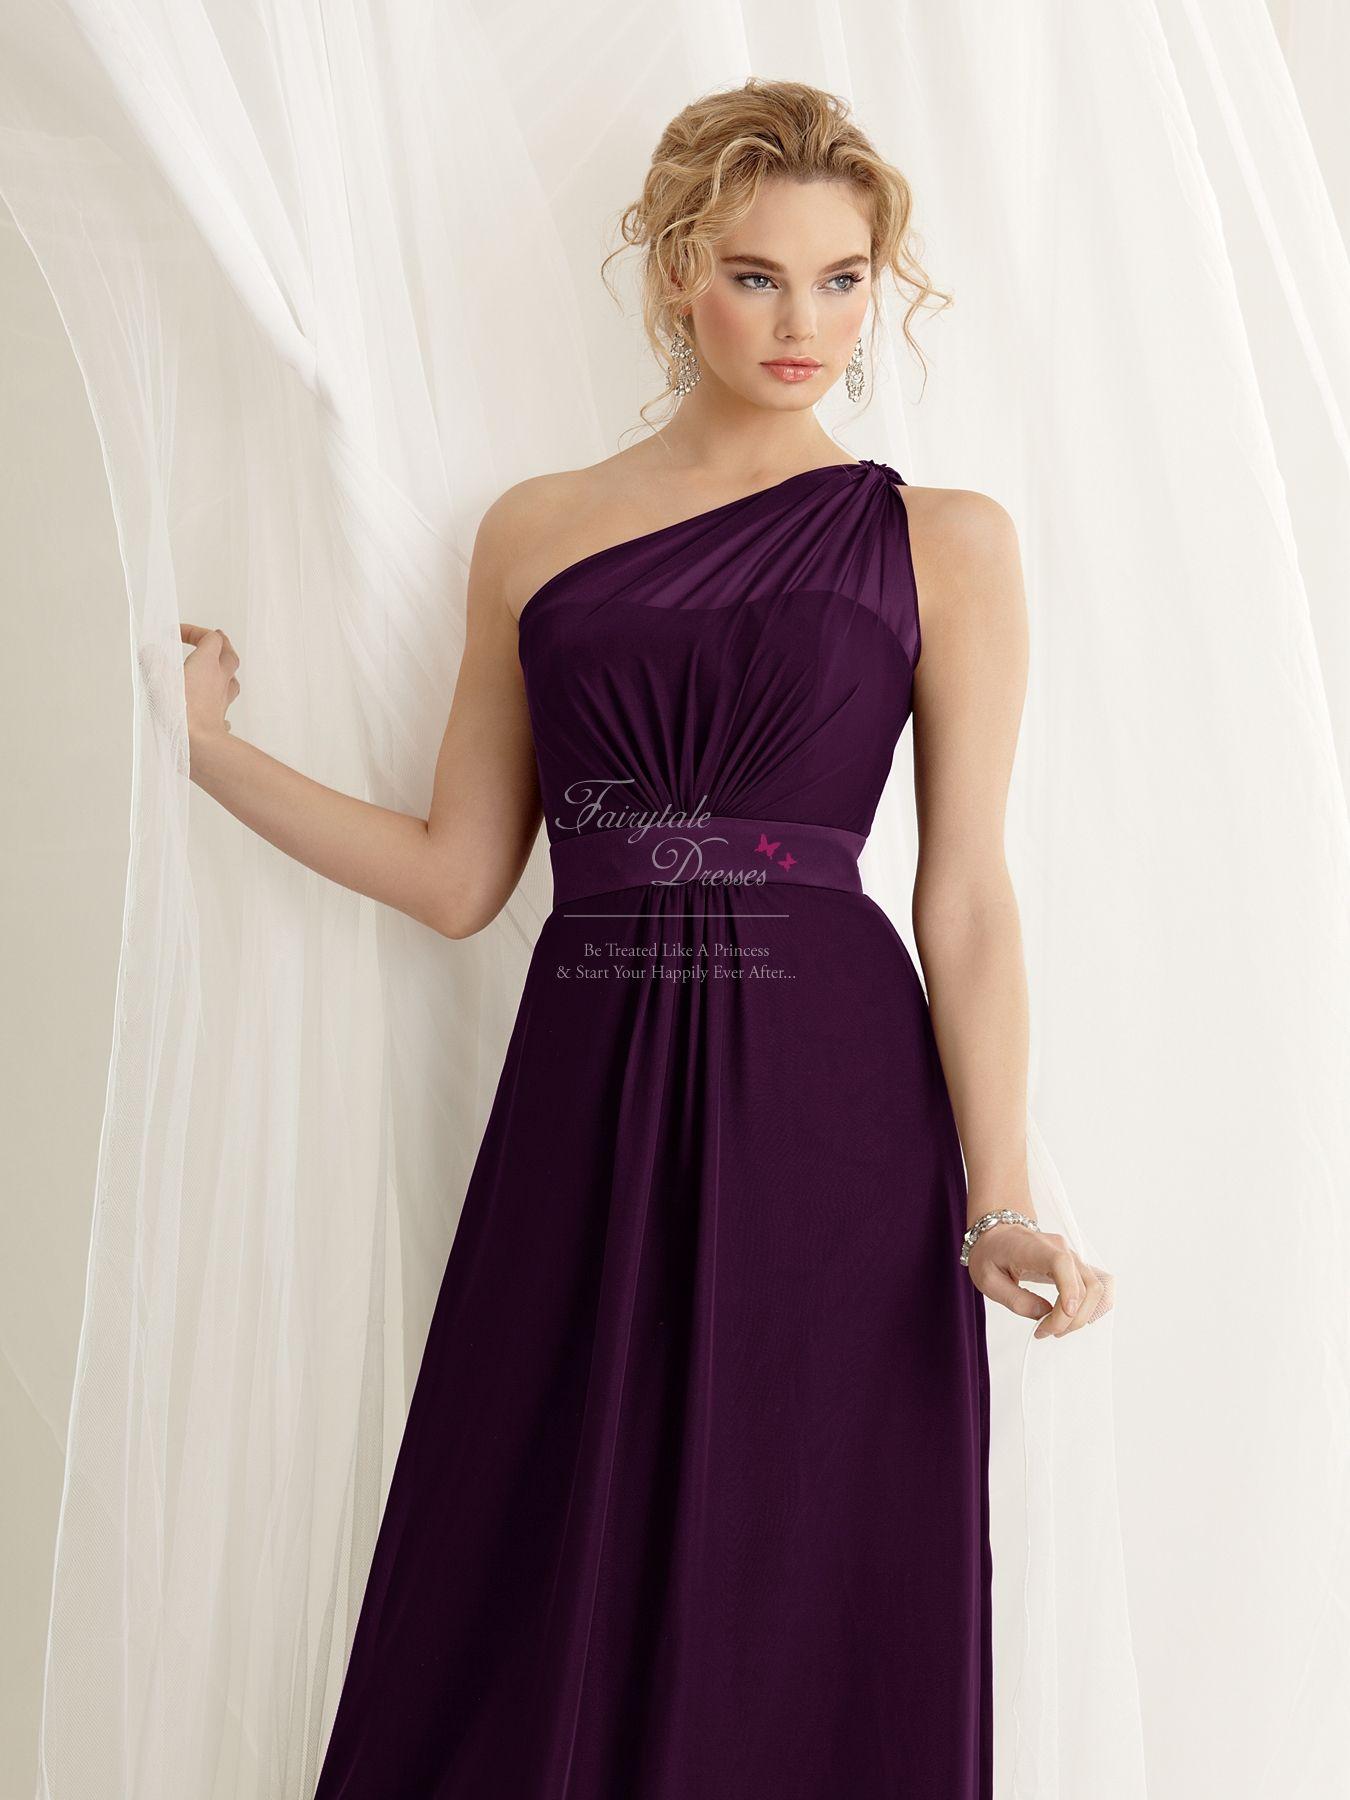 One shoulder strap cadburys purple bridesmaid dress 12019 purple one shoulder strap cadburys purple bridesmaid dress 12019 purple bridemaid dresses uk ombrellifo Images